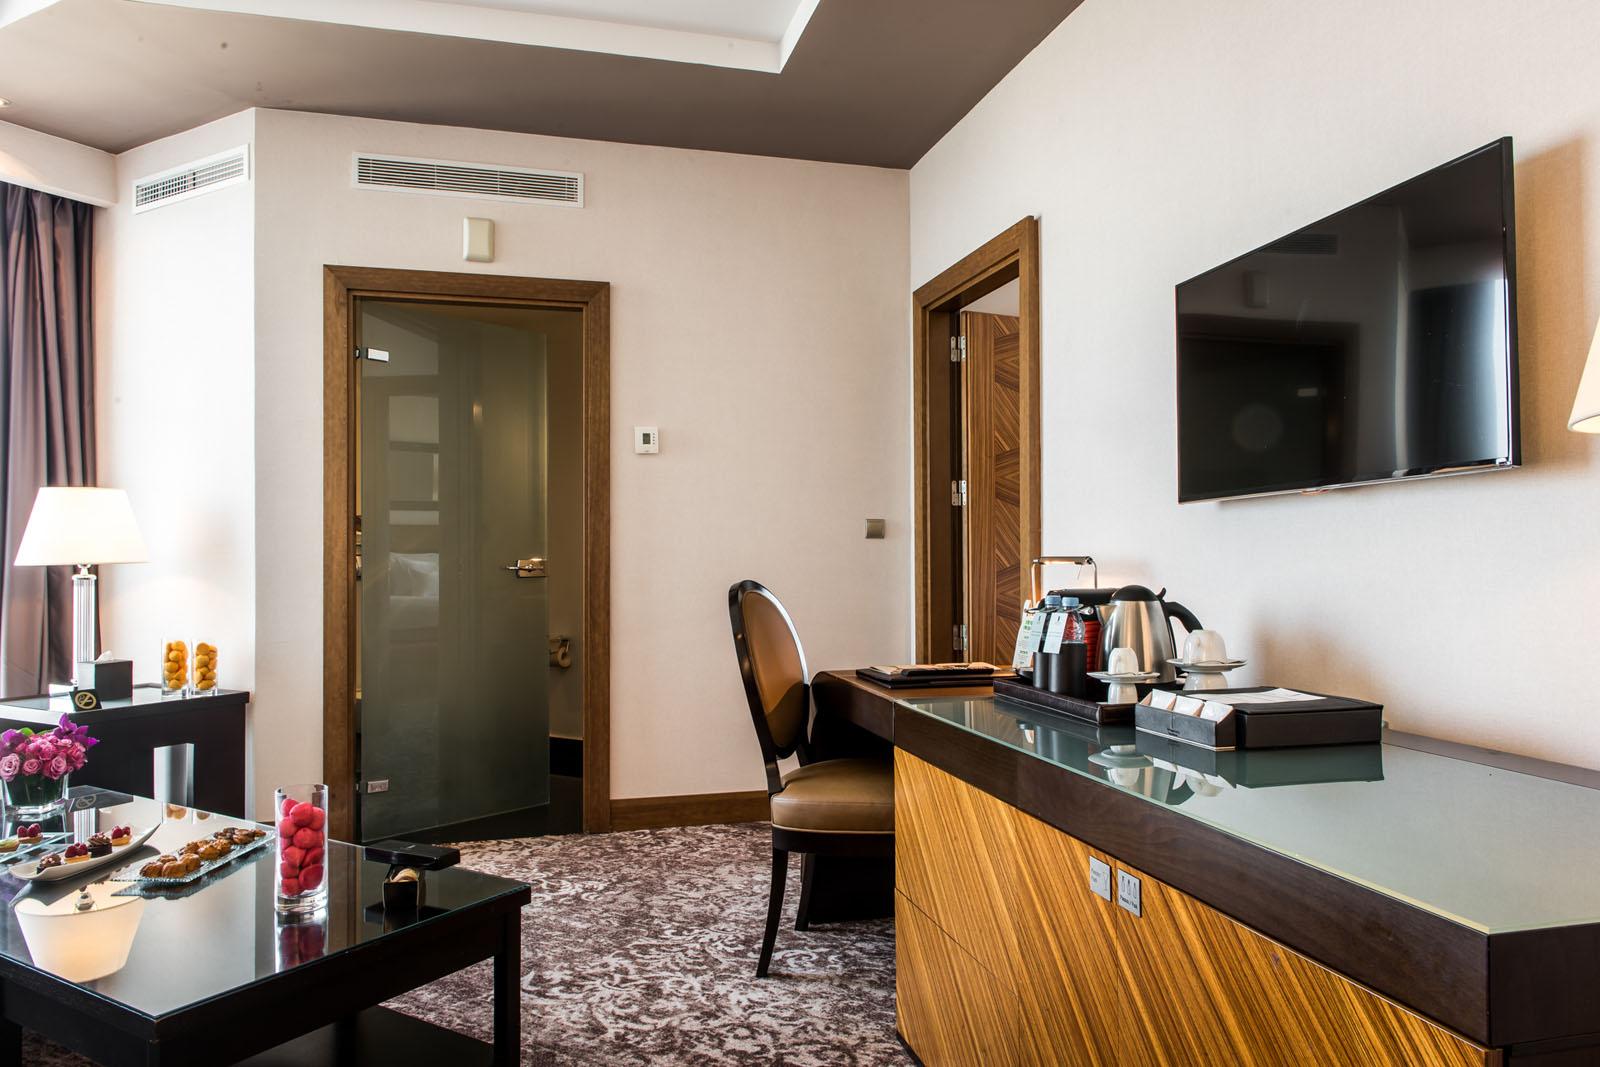 Junior Suite at Kenzi Tower Hotel in central Casablanca, Morocco